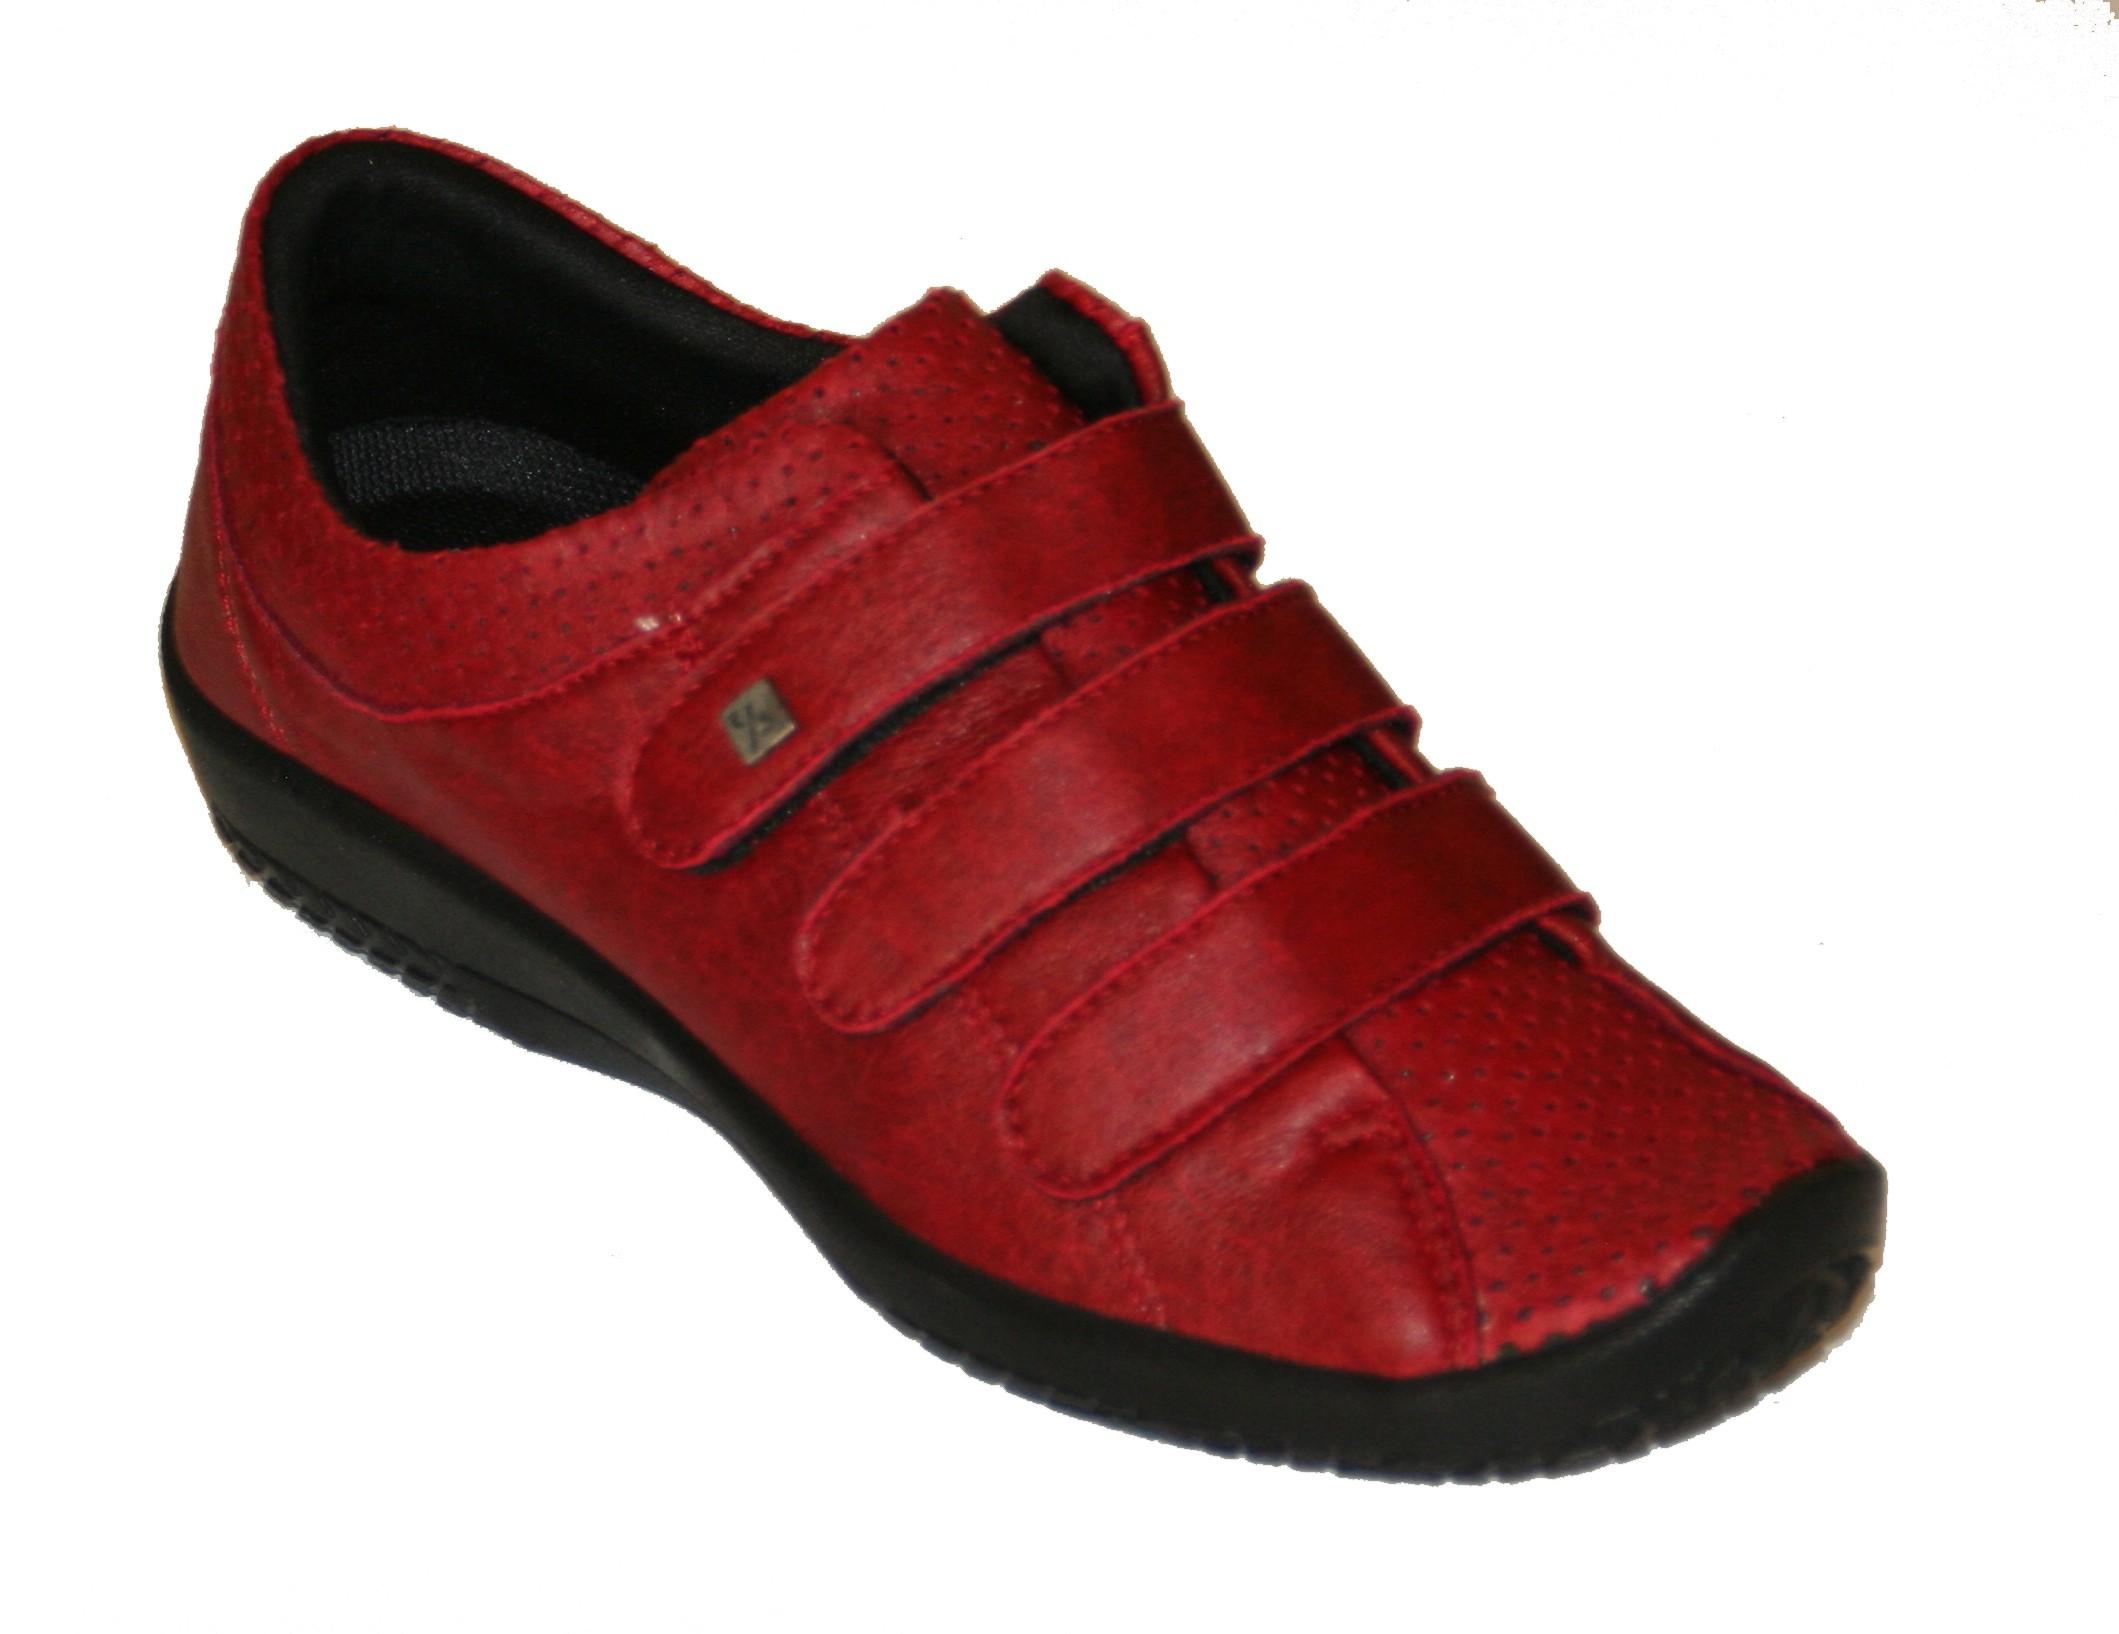 67408249a8ed Berømte Fantastisk Arcopedico sko til dårlige